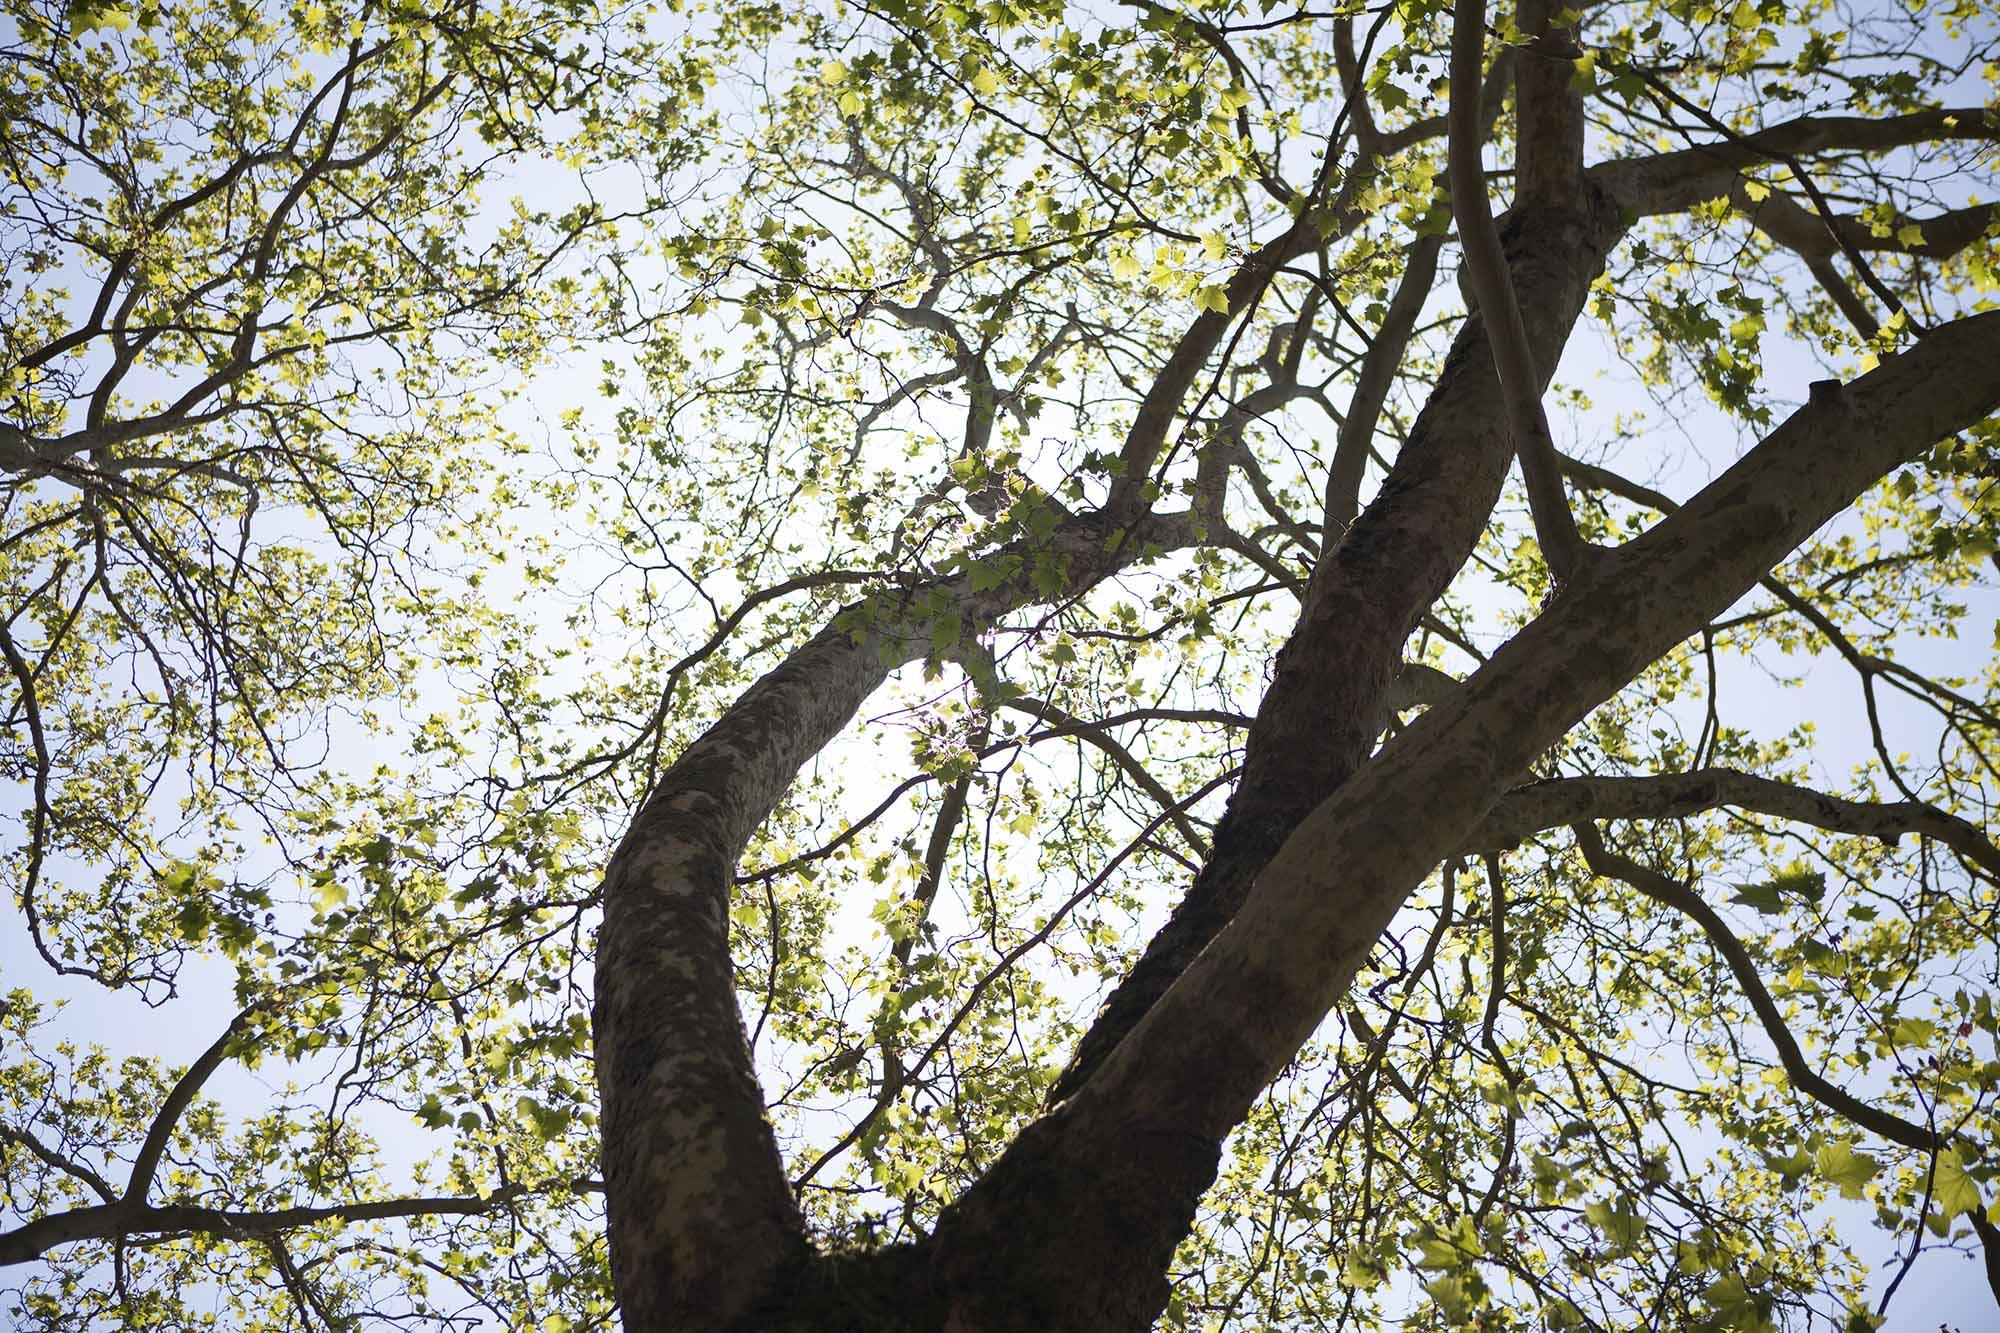 Image of tree in sunlight